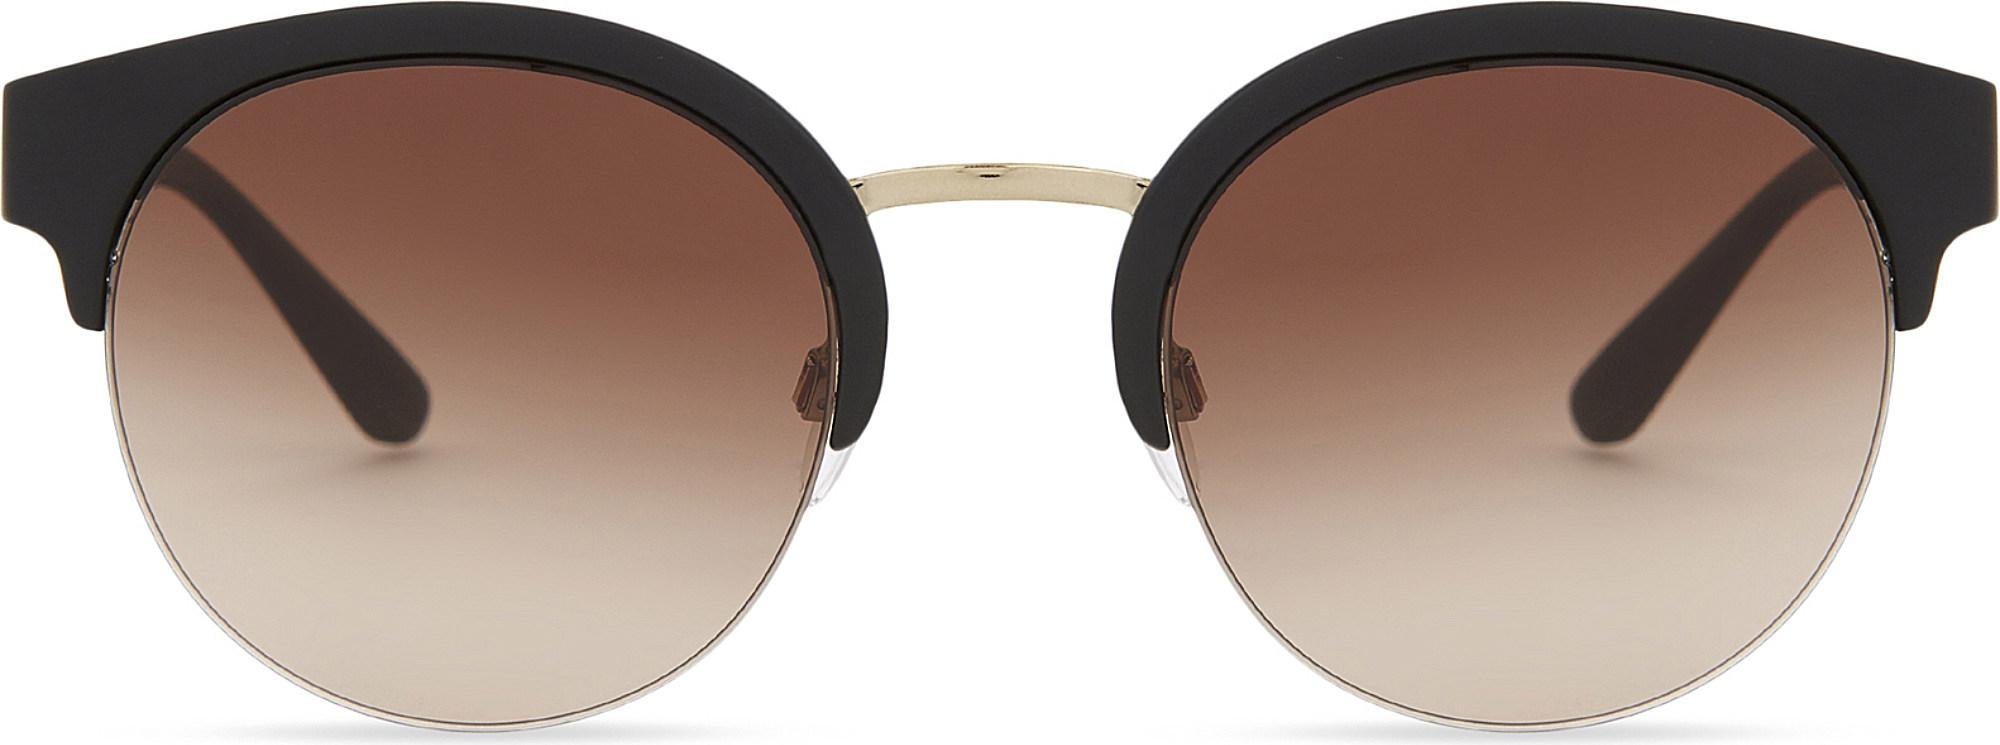 ccd249cf8a6 Burberry. Women s Metallic Be4241 Check-detail Round Half-frame Sunglasses